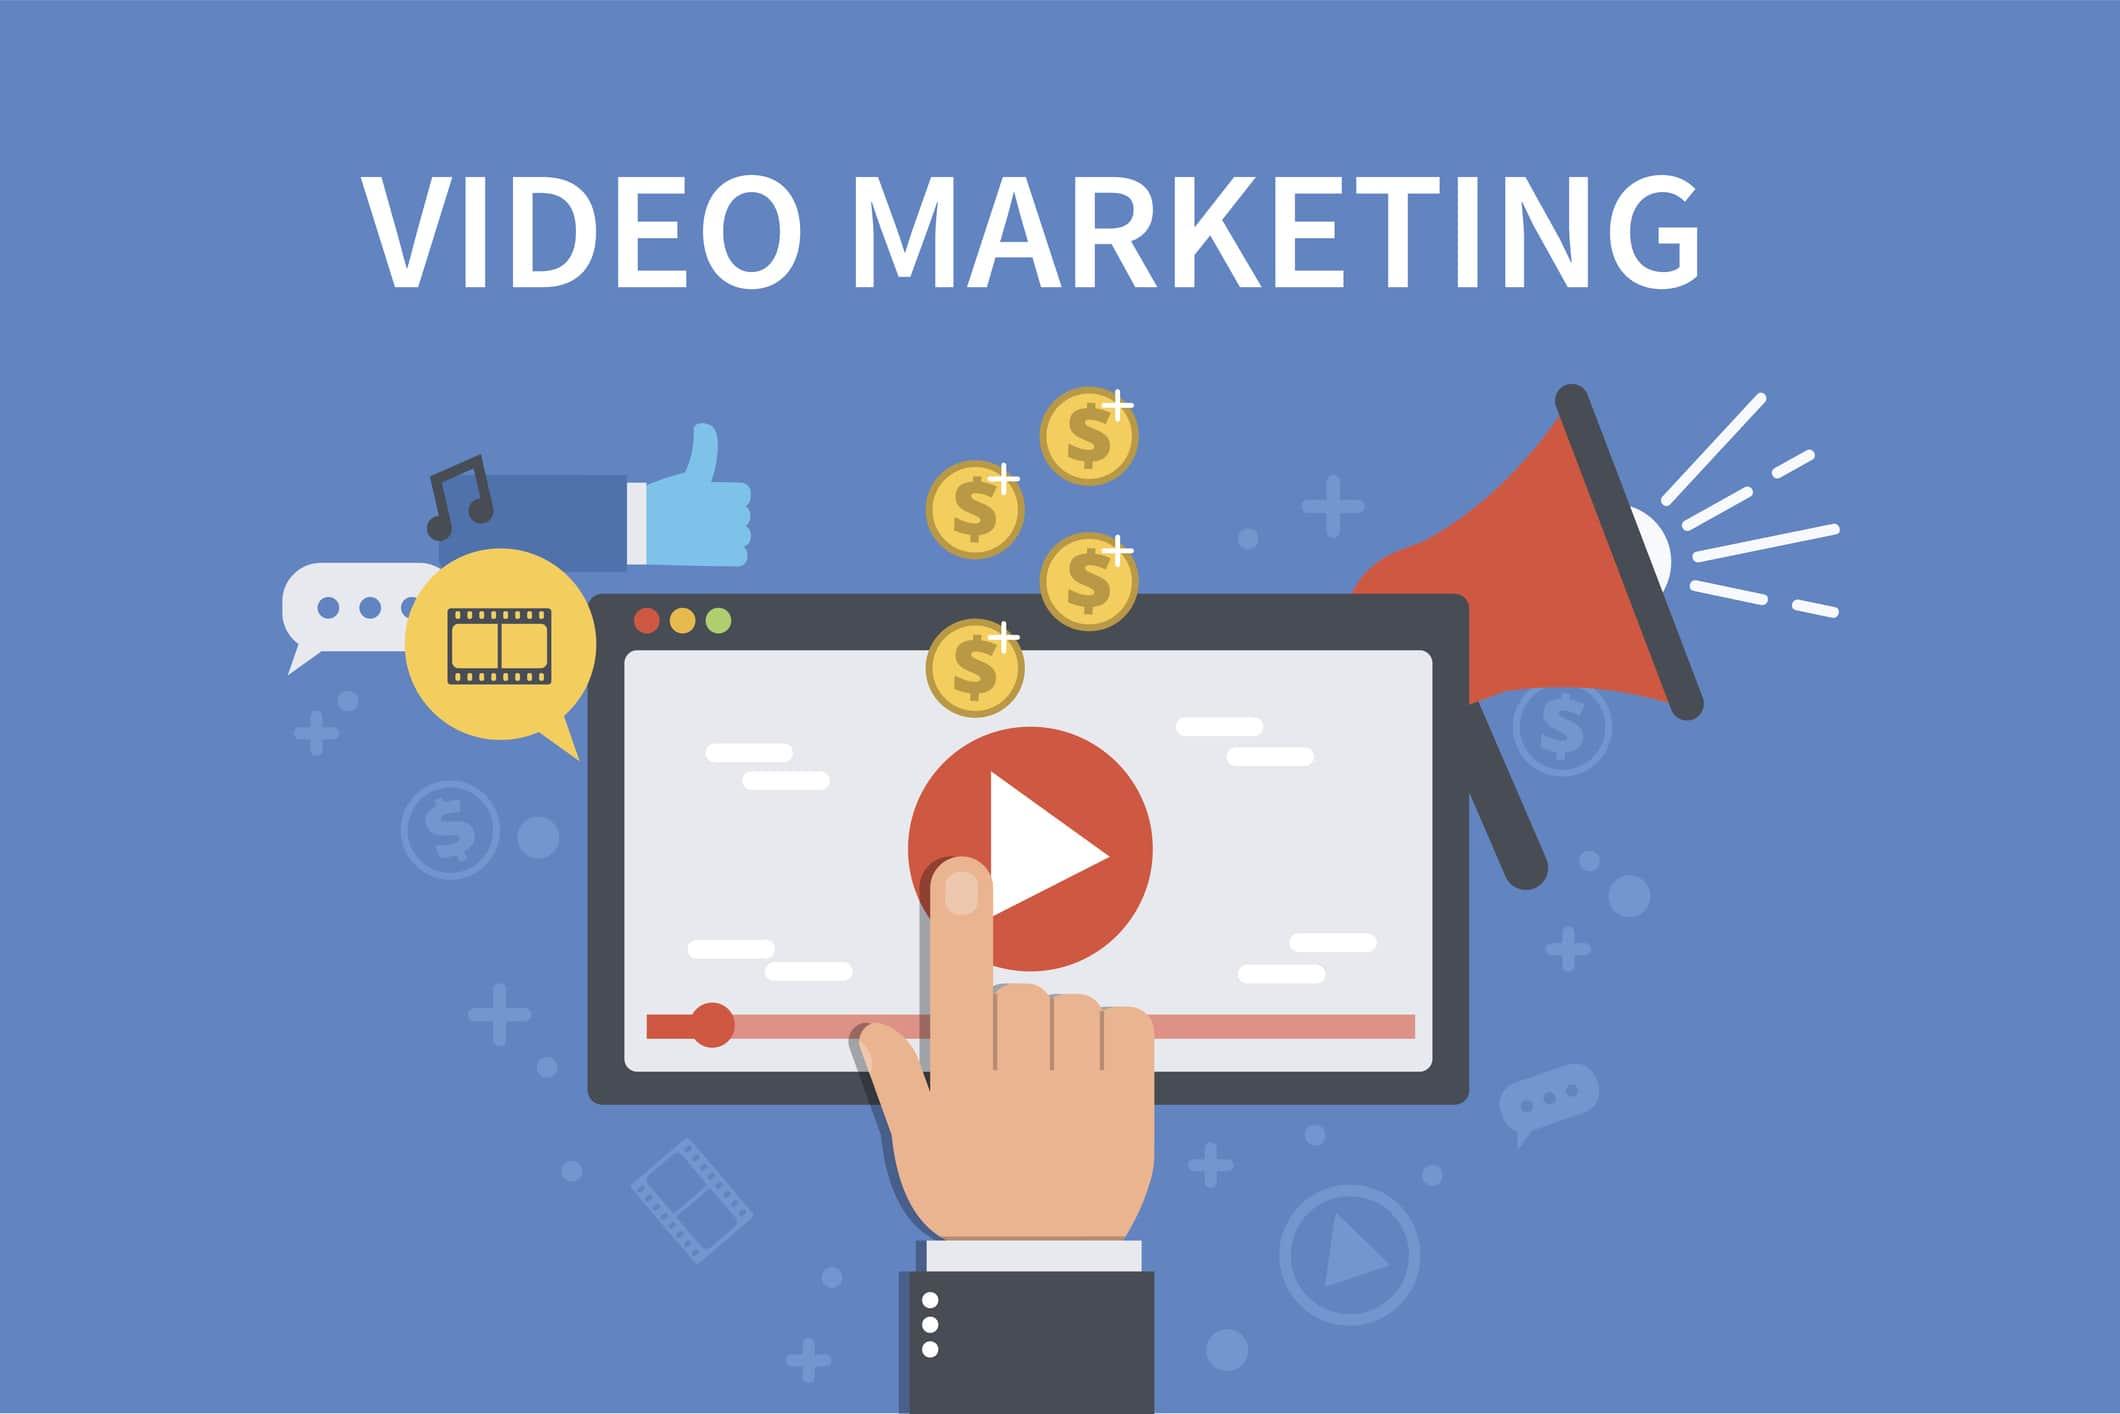 Online Video Platform Comparison Best Video Hosting Services 2017 - monetization